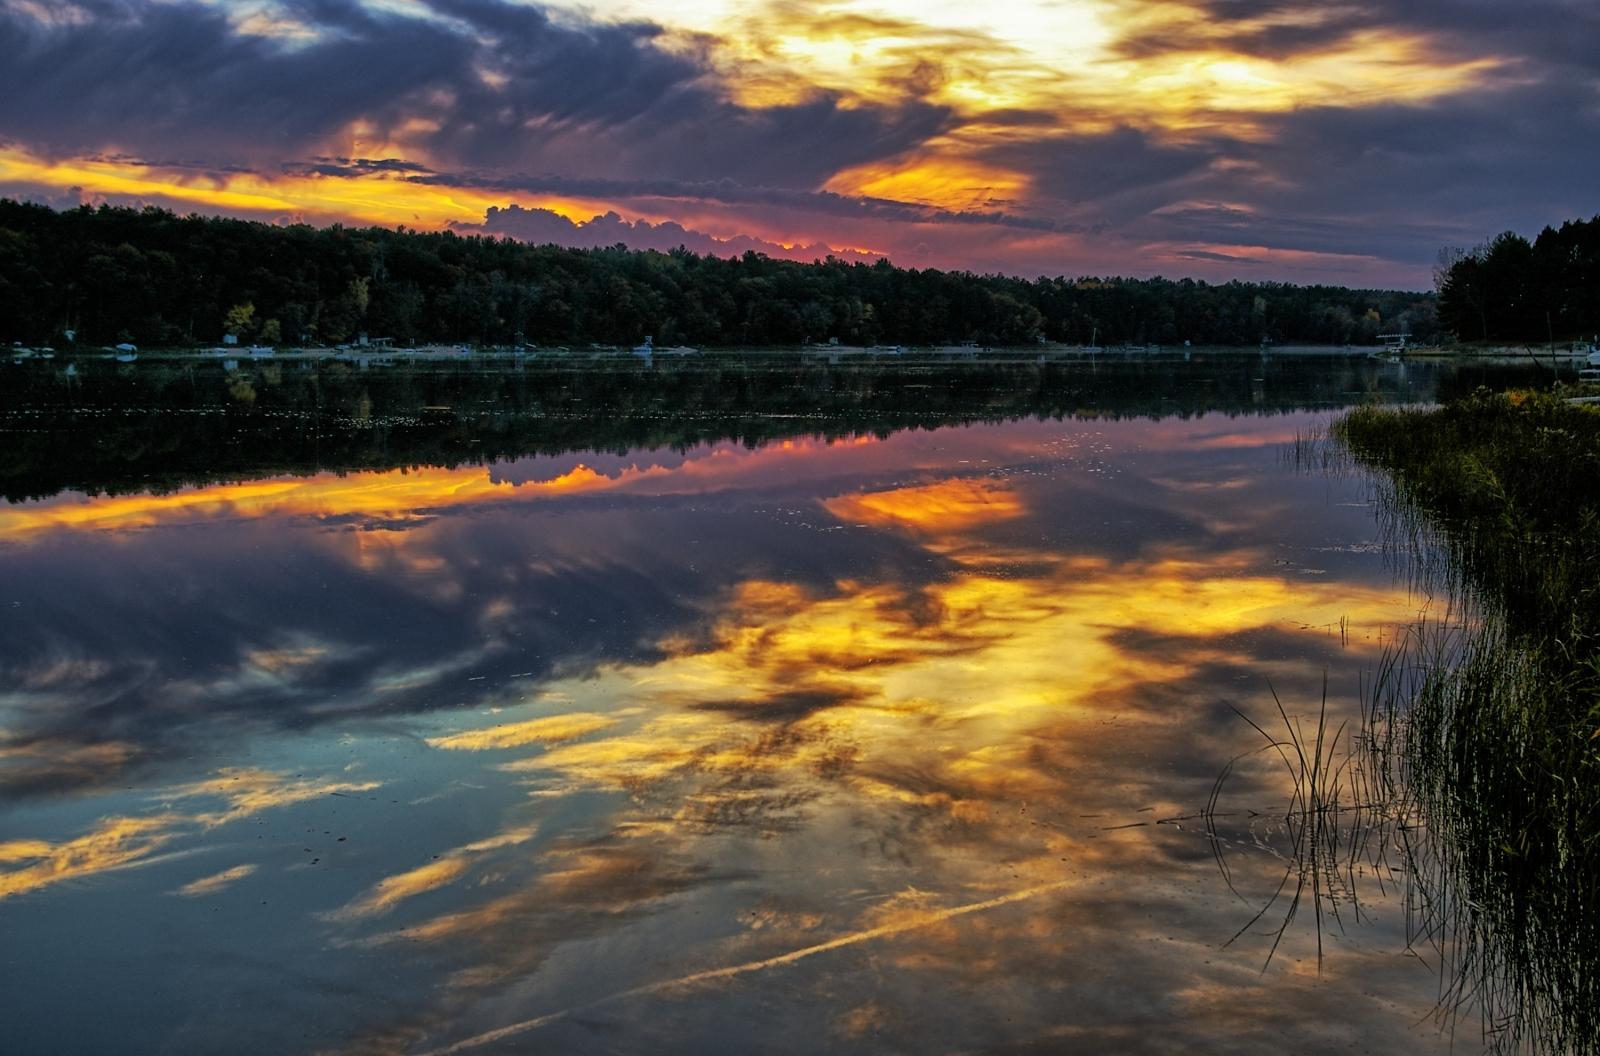 Richford Wi Usa Sunrise Sunset Times